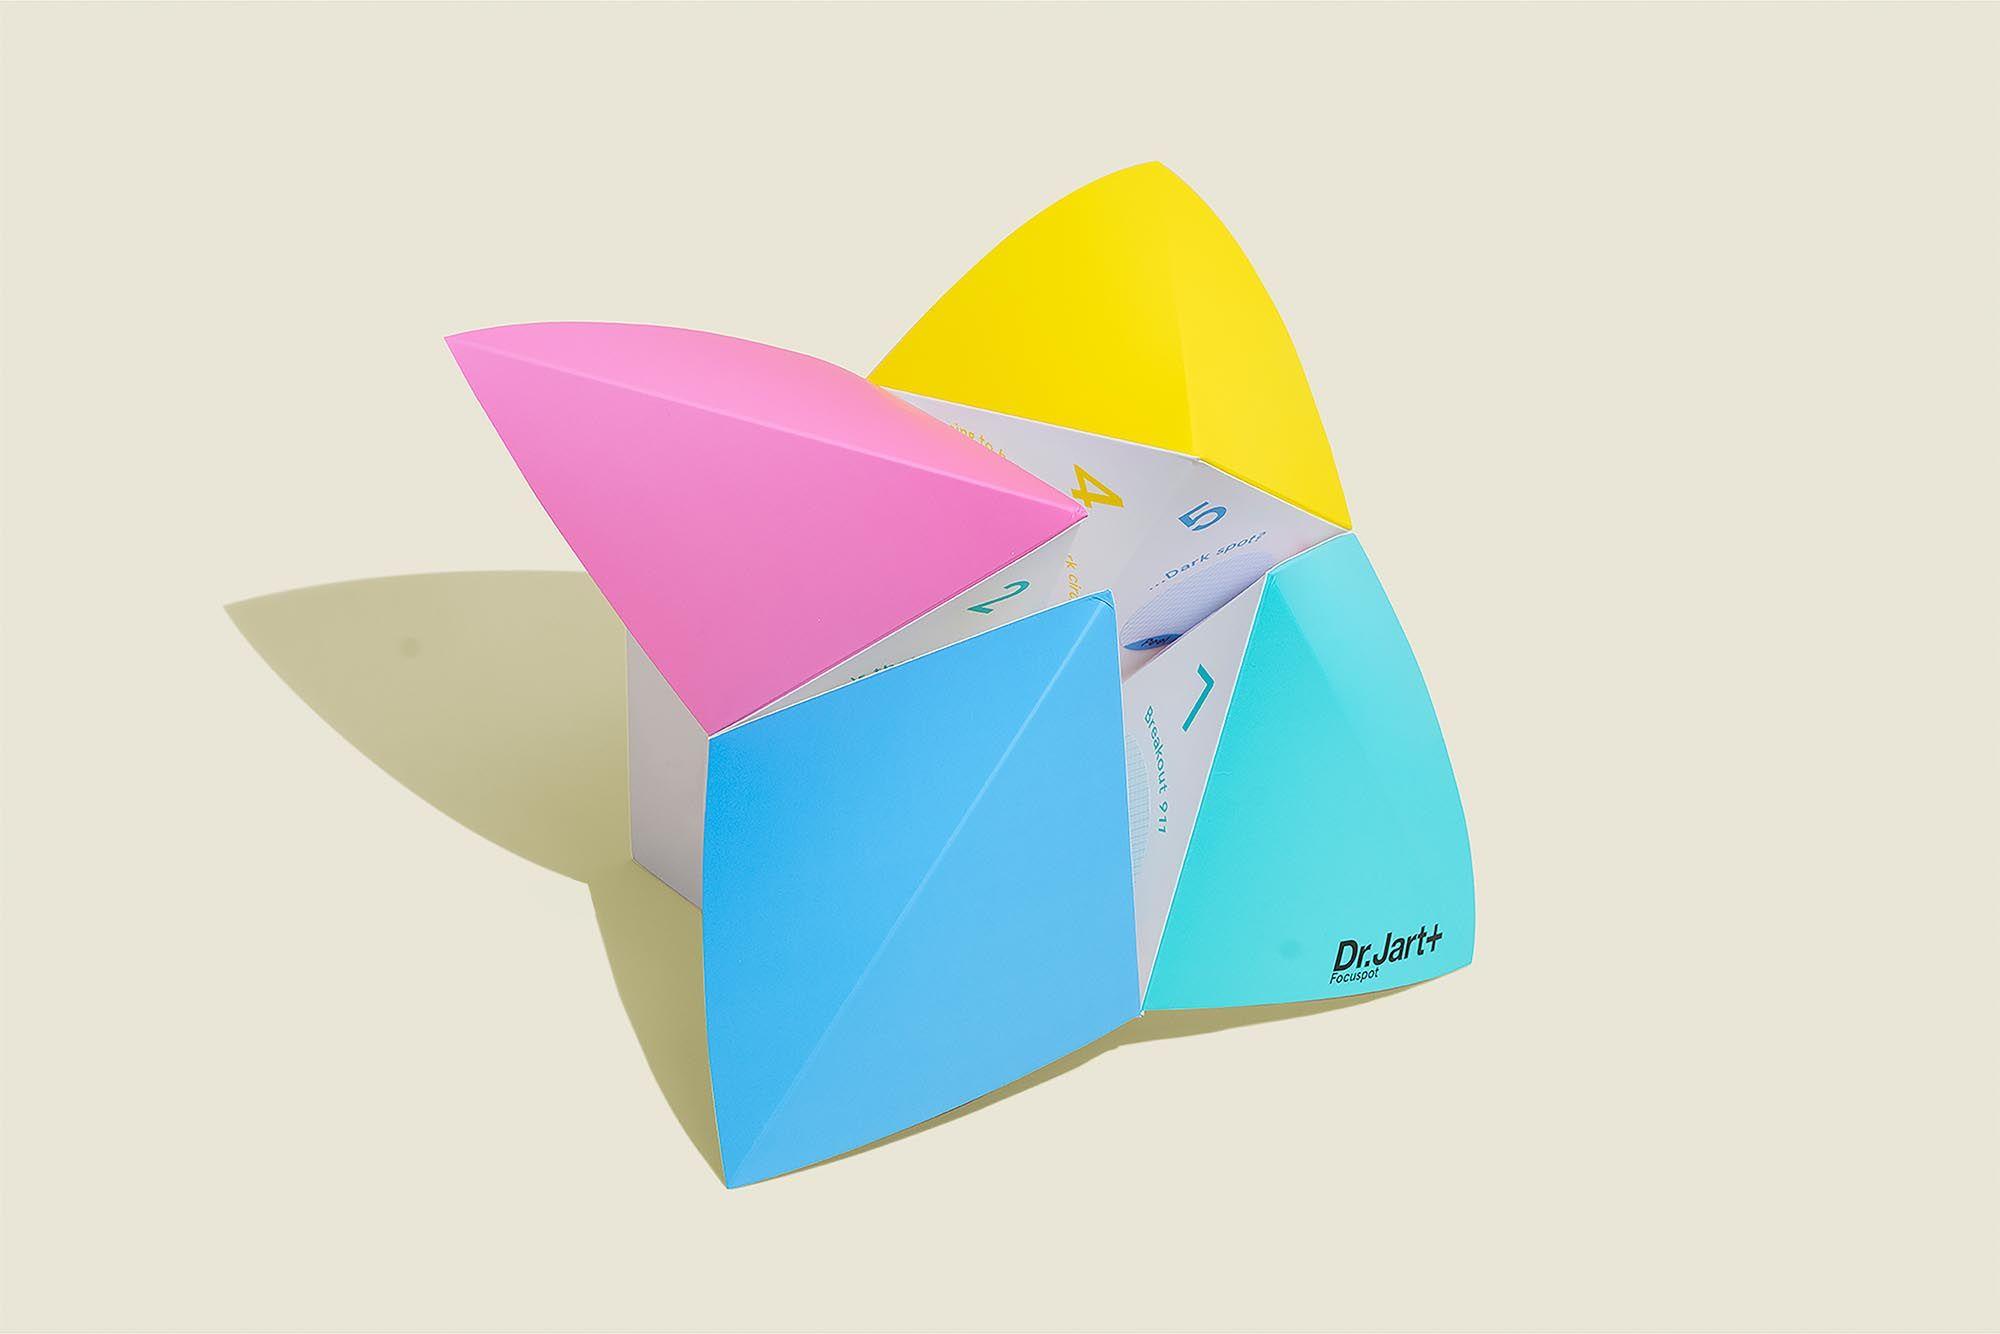 Origami paper game